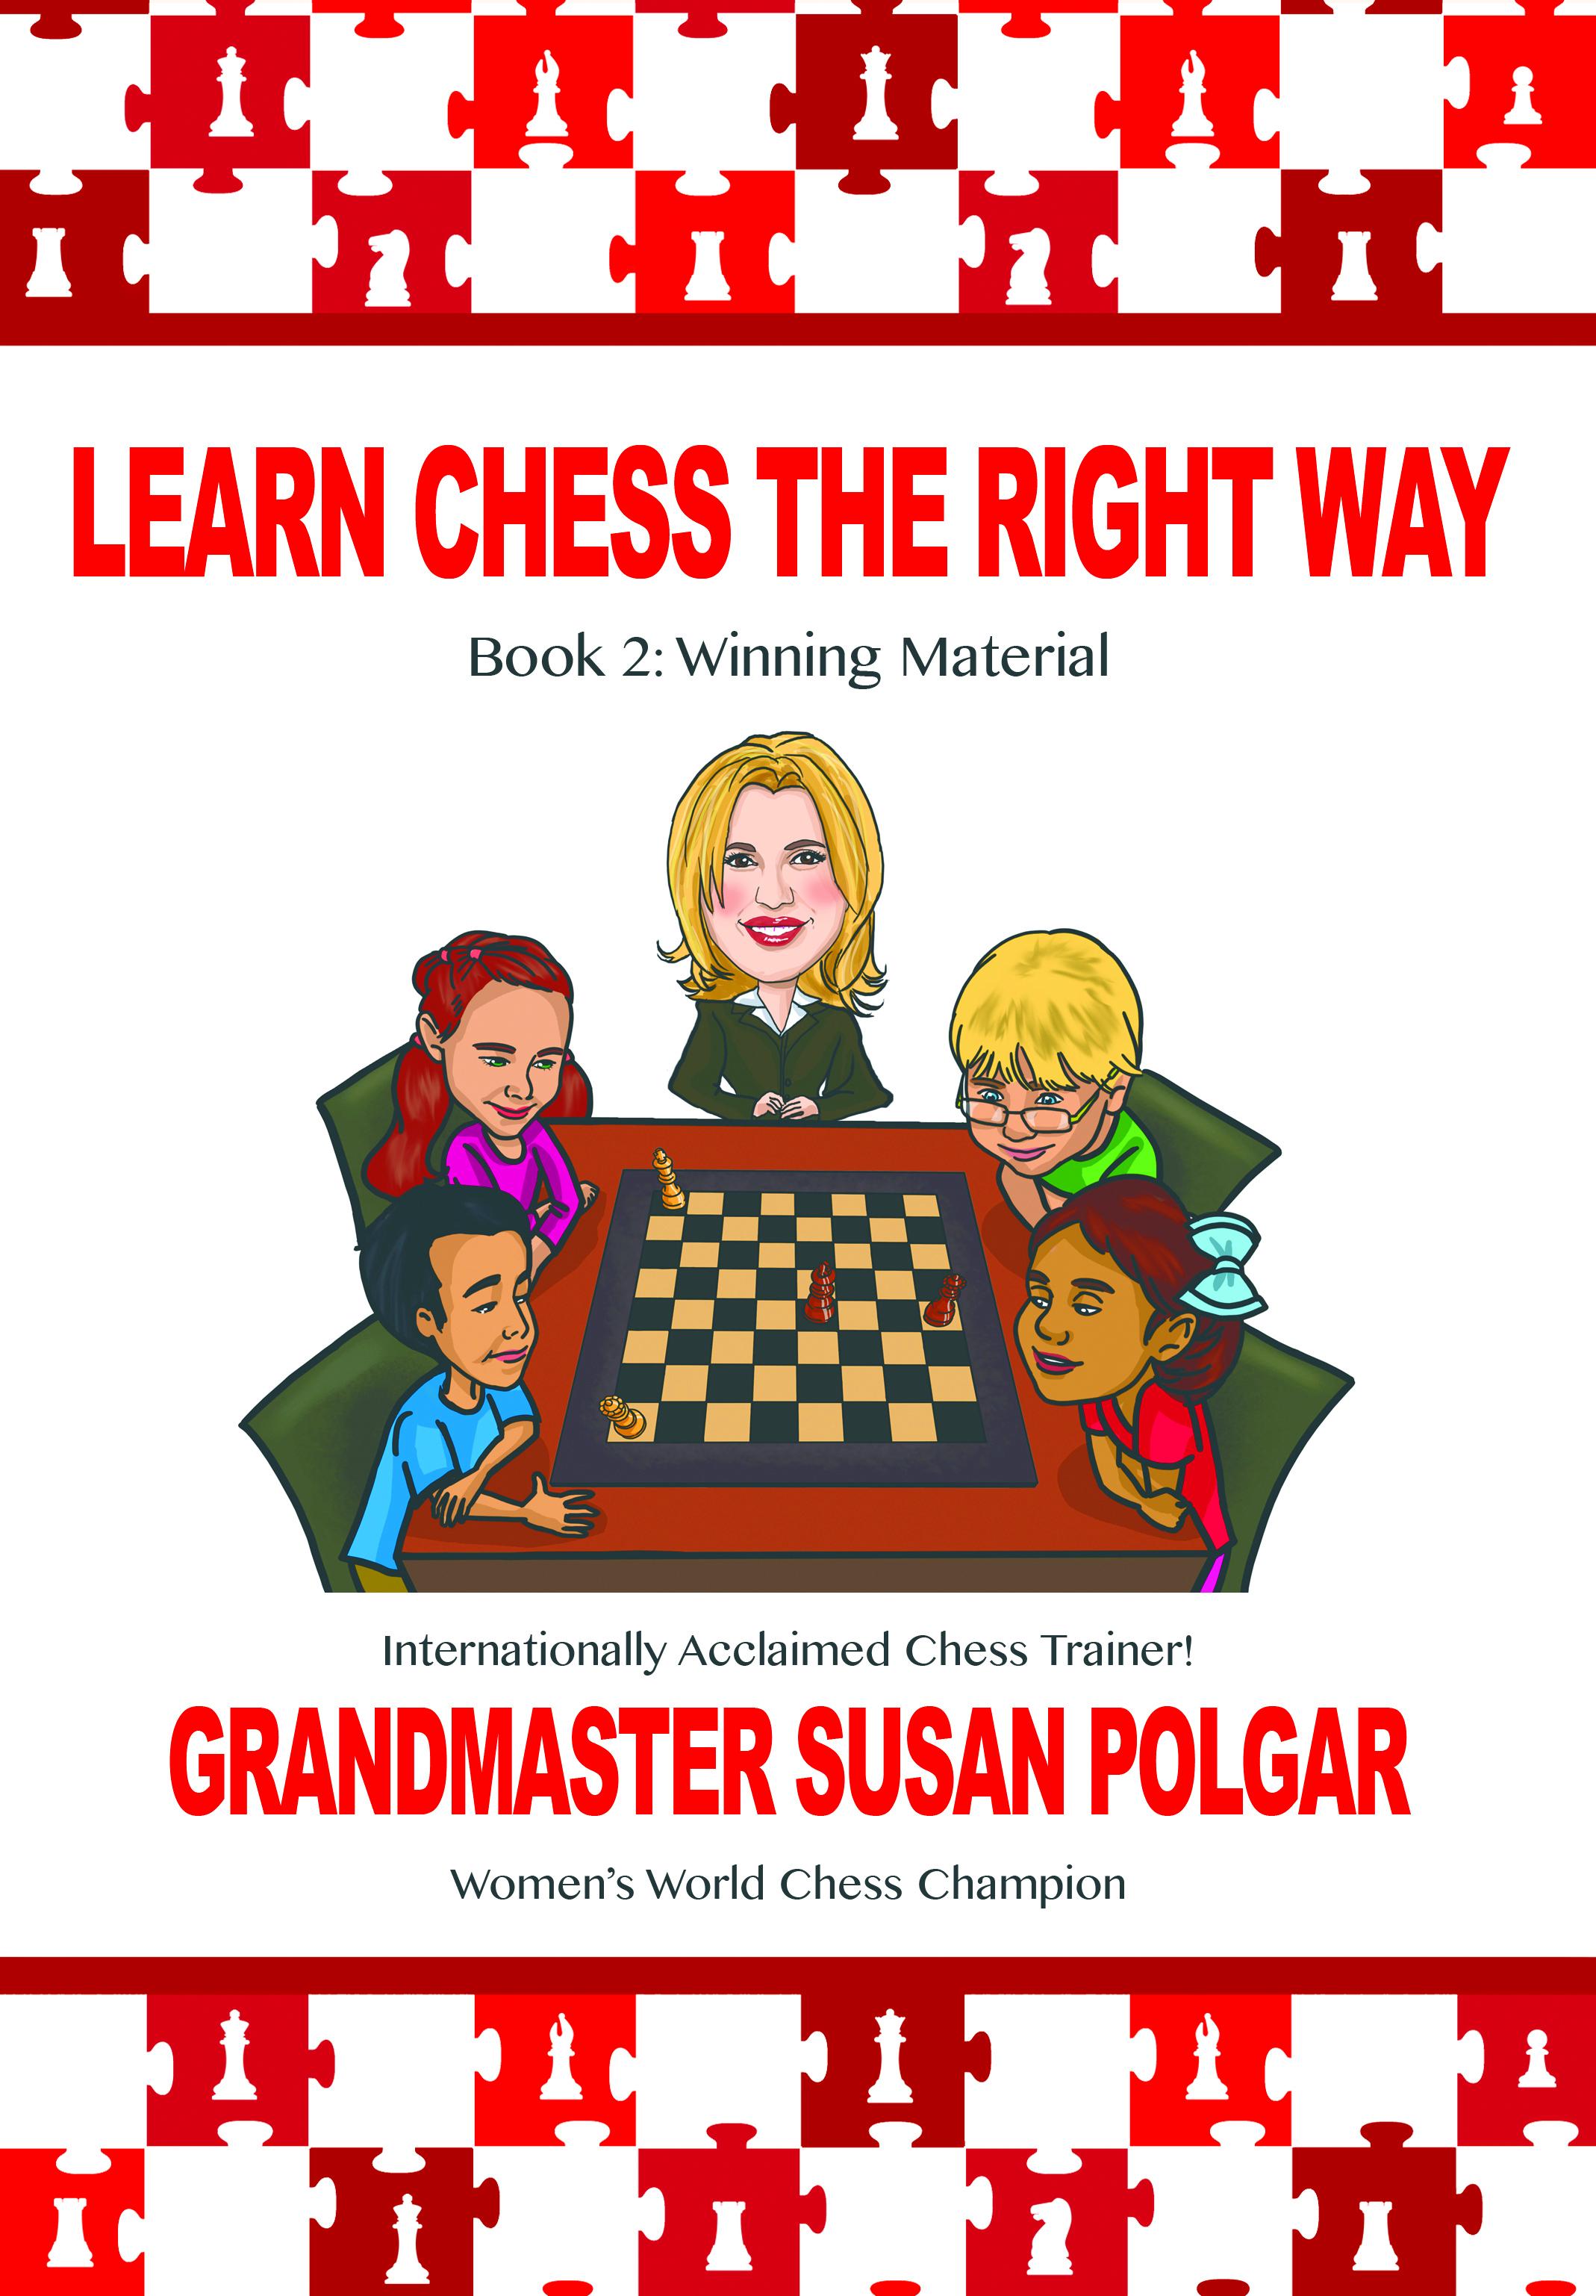 4 way chess online diagram of uterus and bladder susan polgar global daily news information